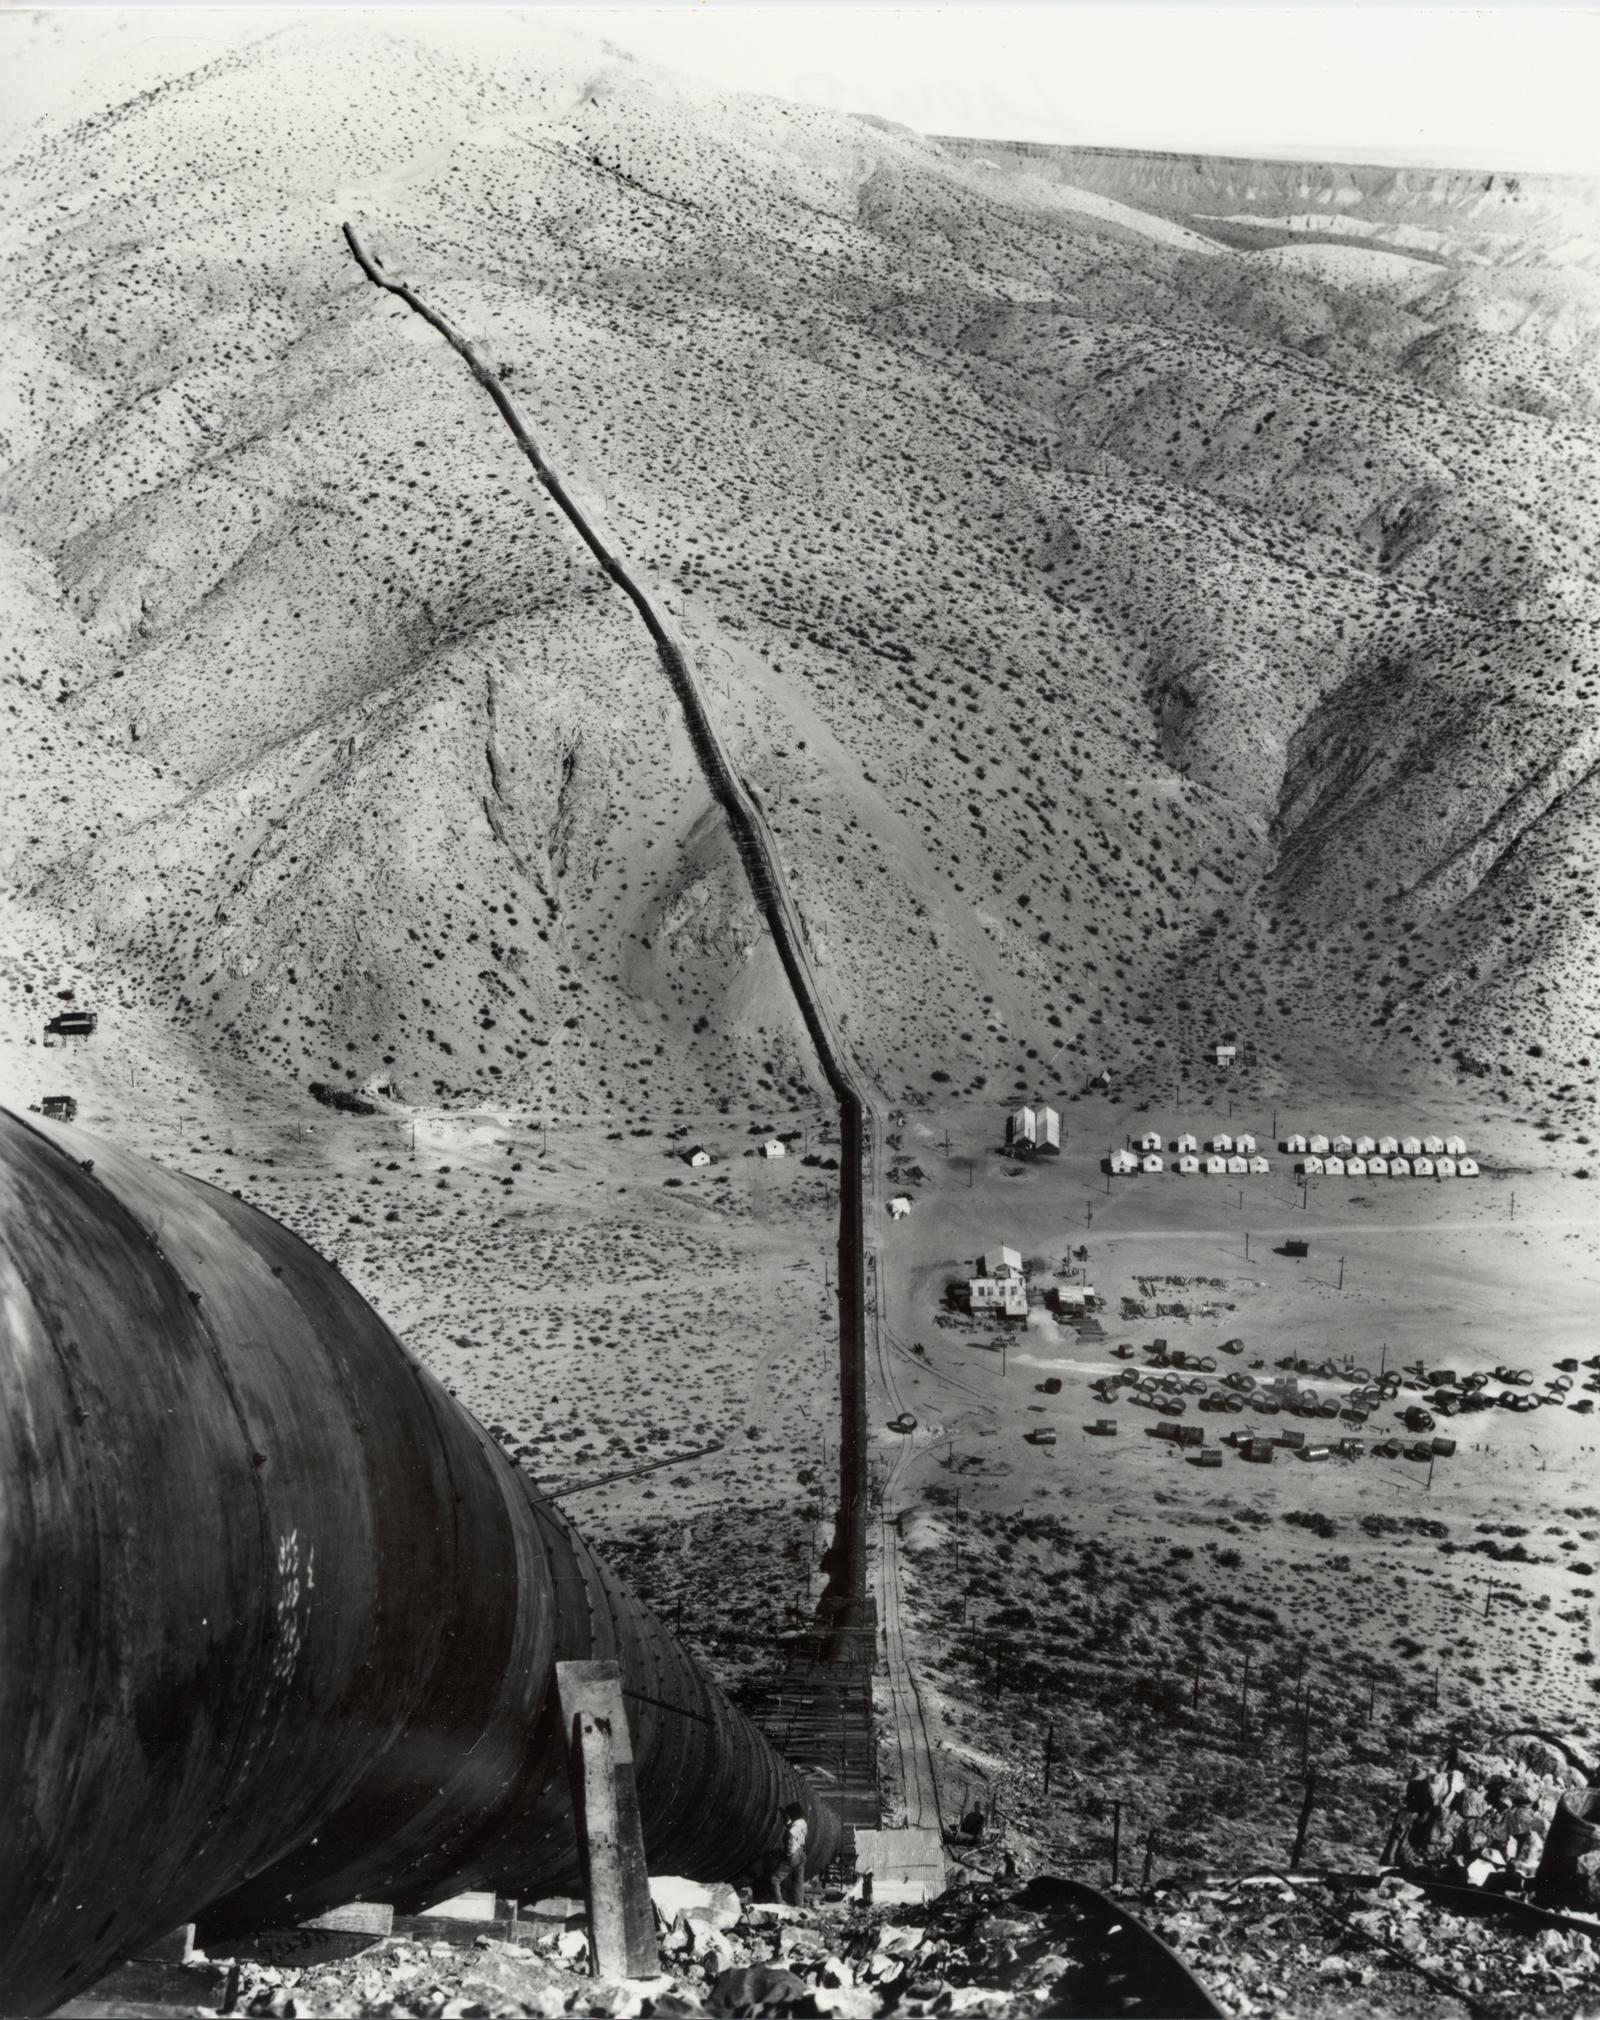 Scvhistory Com Lw2420 Los Angeles Aqueduct Jawbone Siphon Under Construction